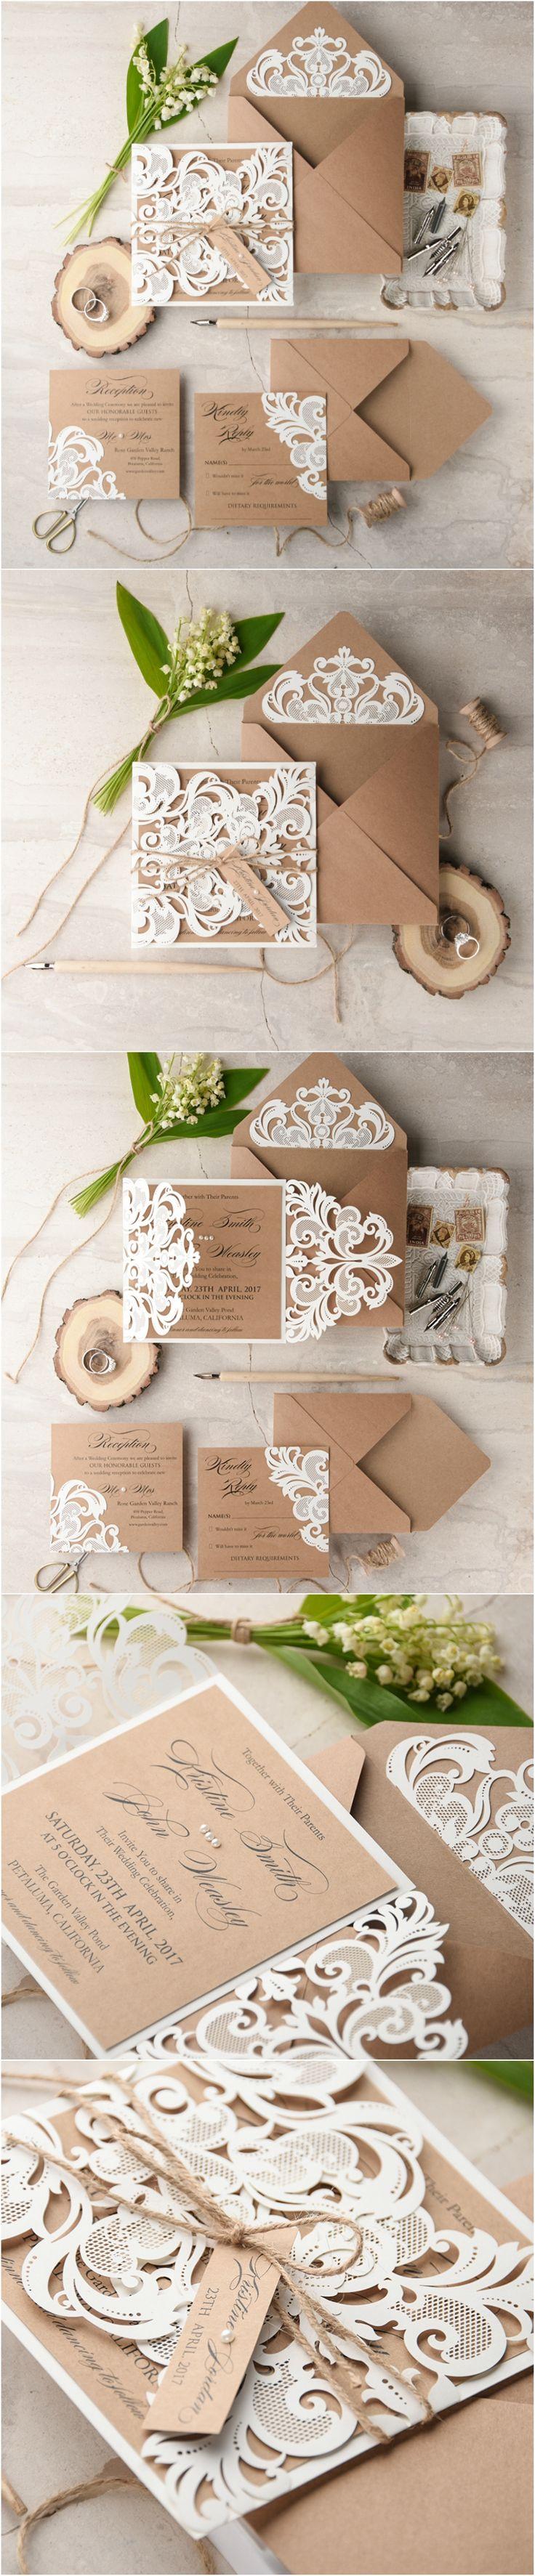 Laser Cut Lace Rustic Romantic Wedding Invitations from 4lovepolkadots